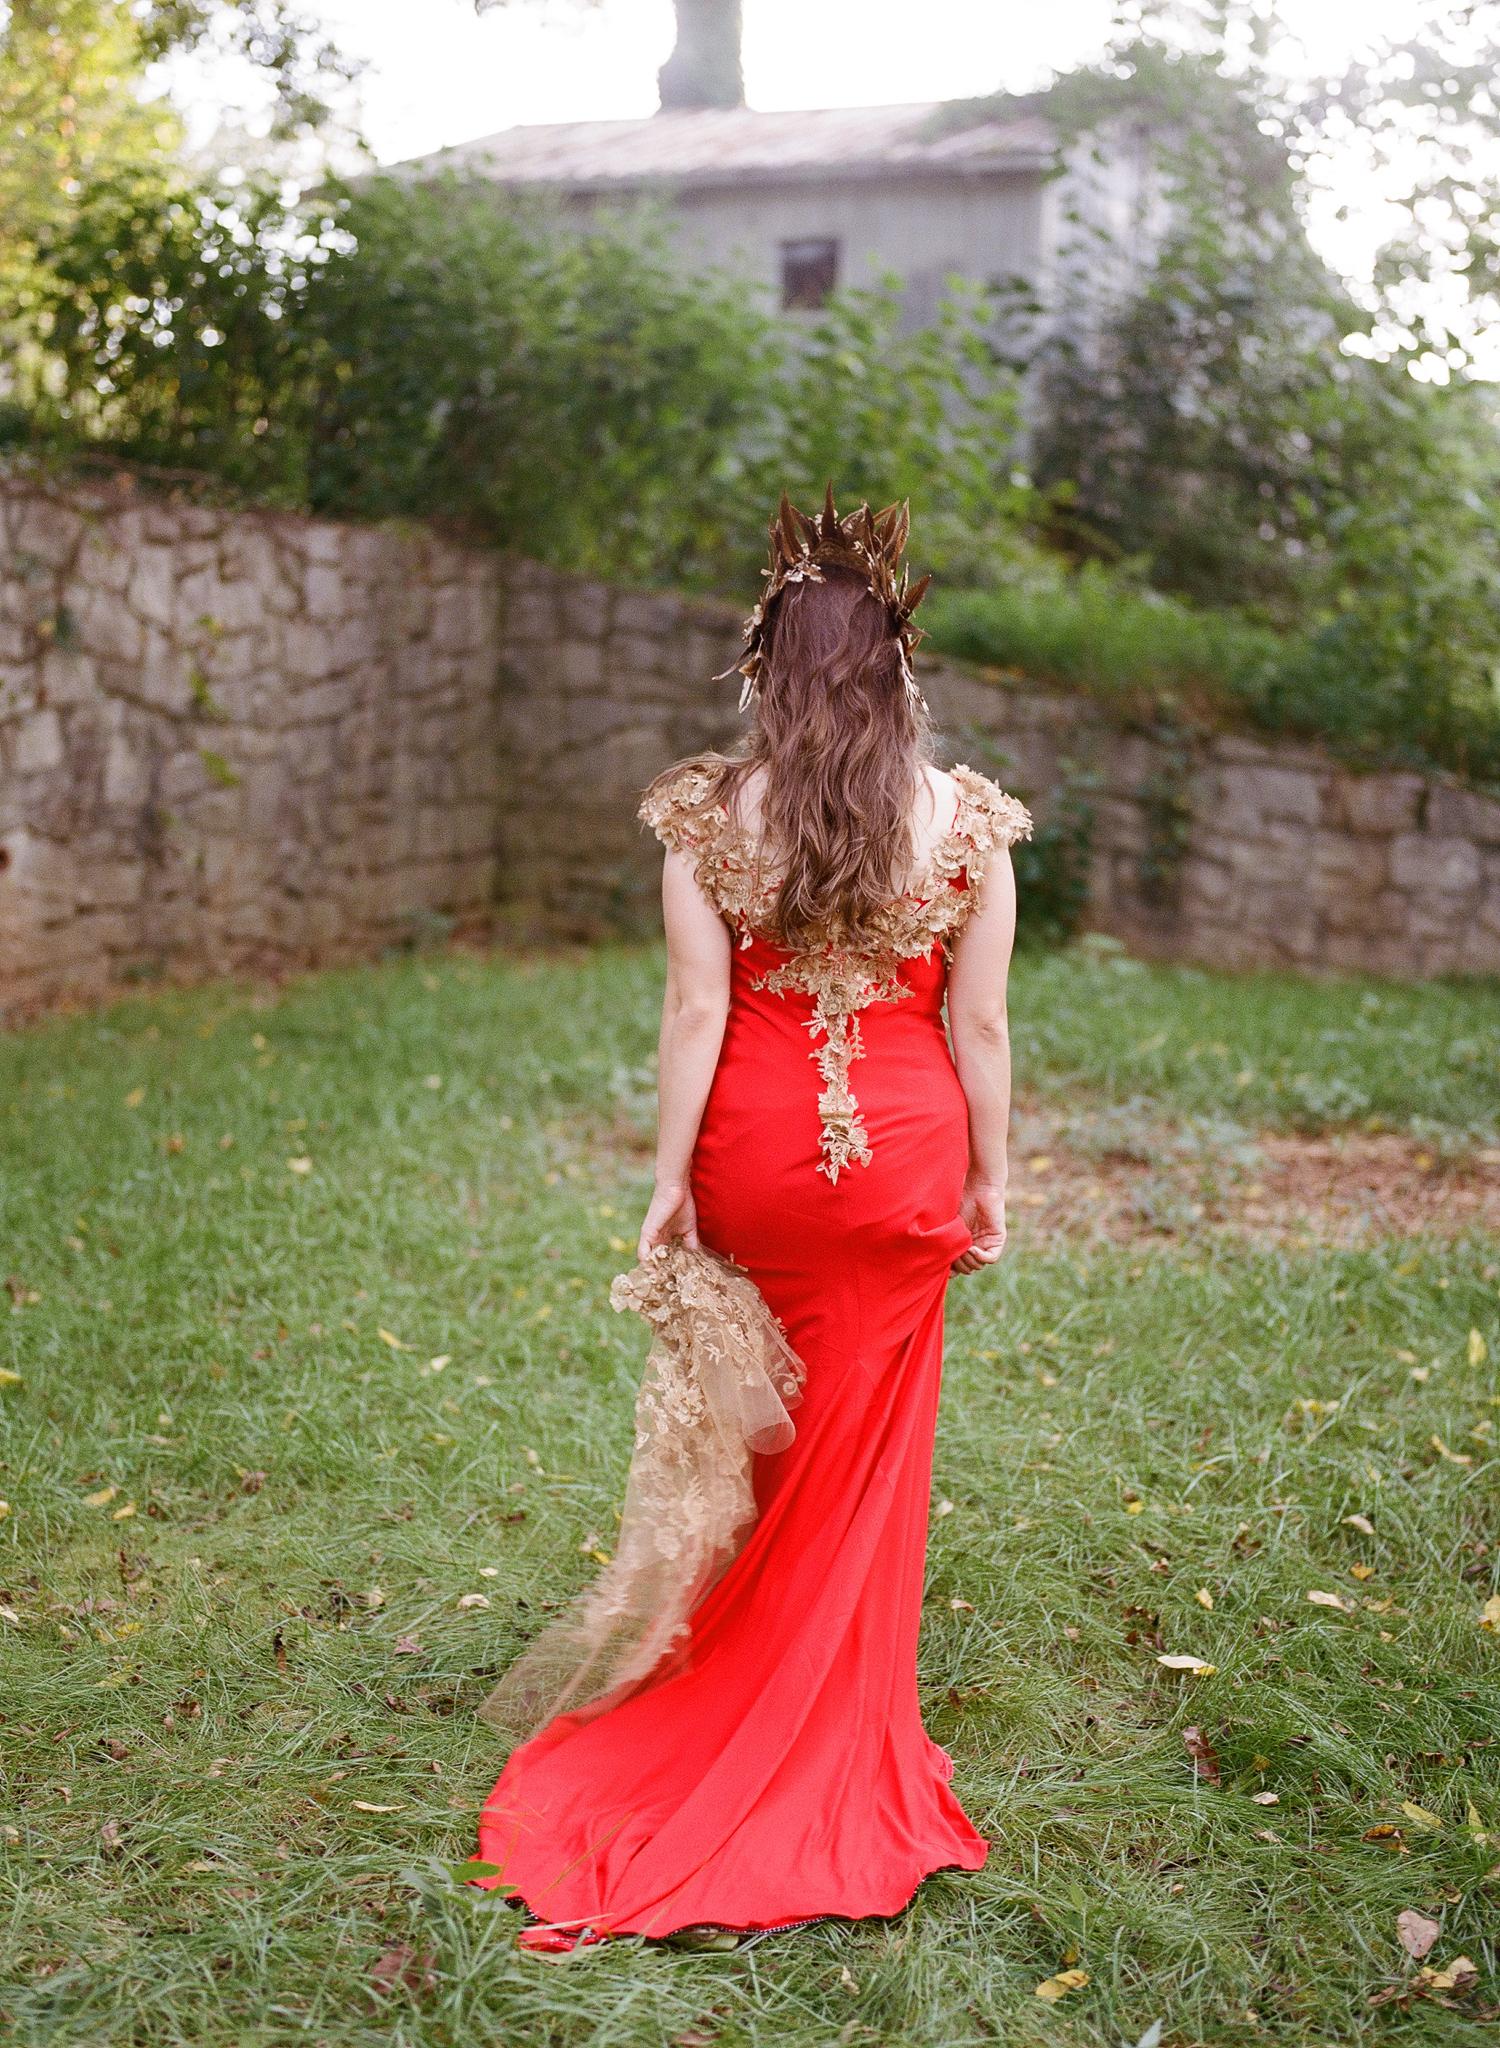 29-bride-red-wedding-dress.jpg